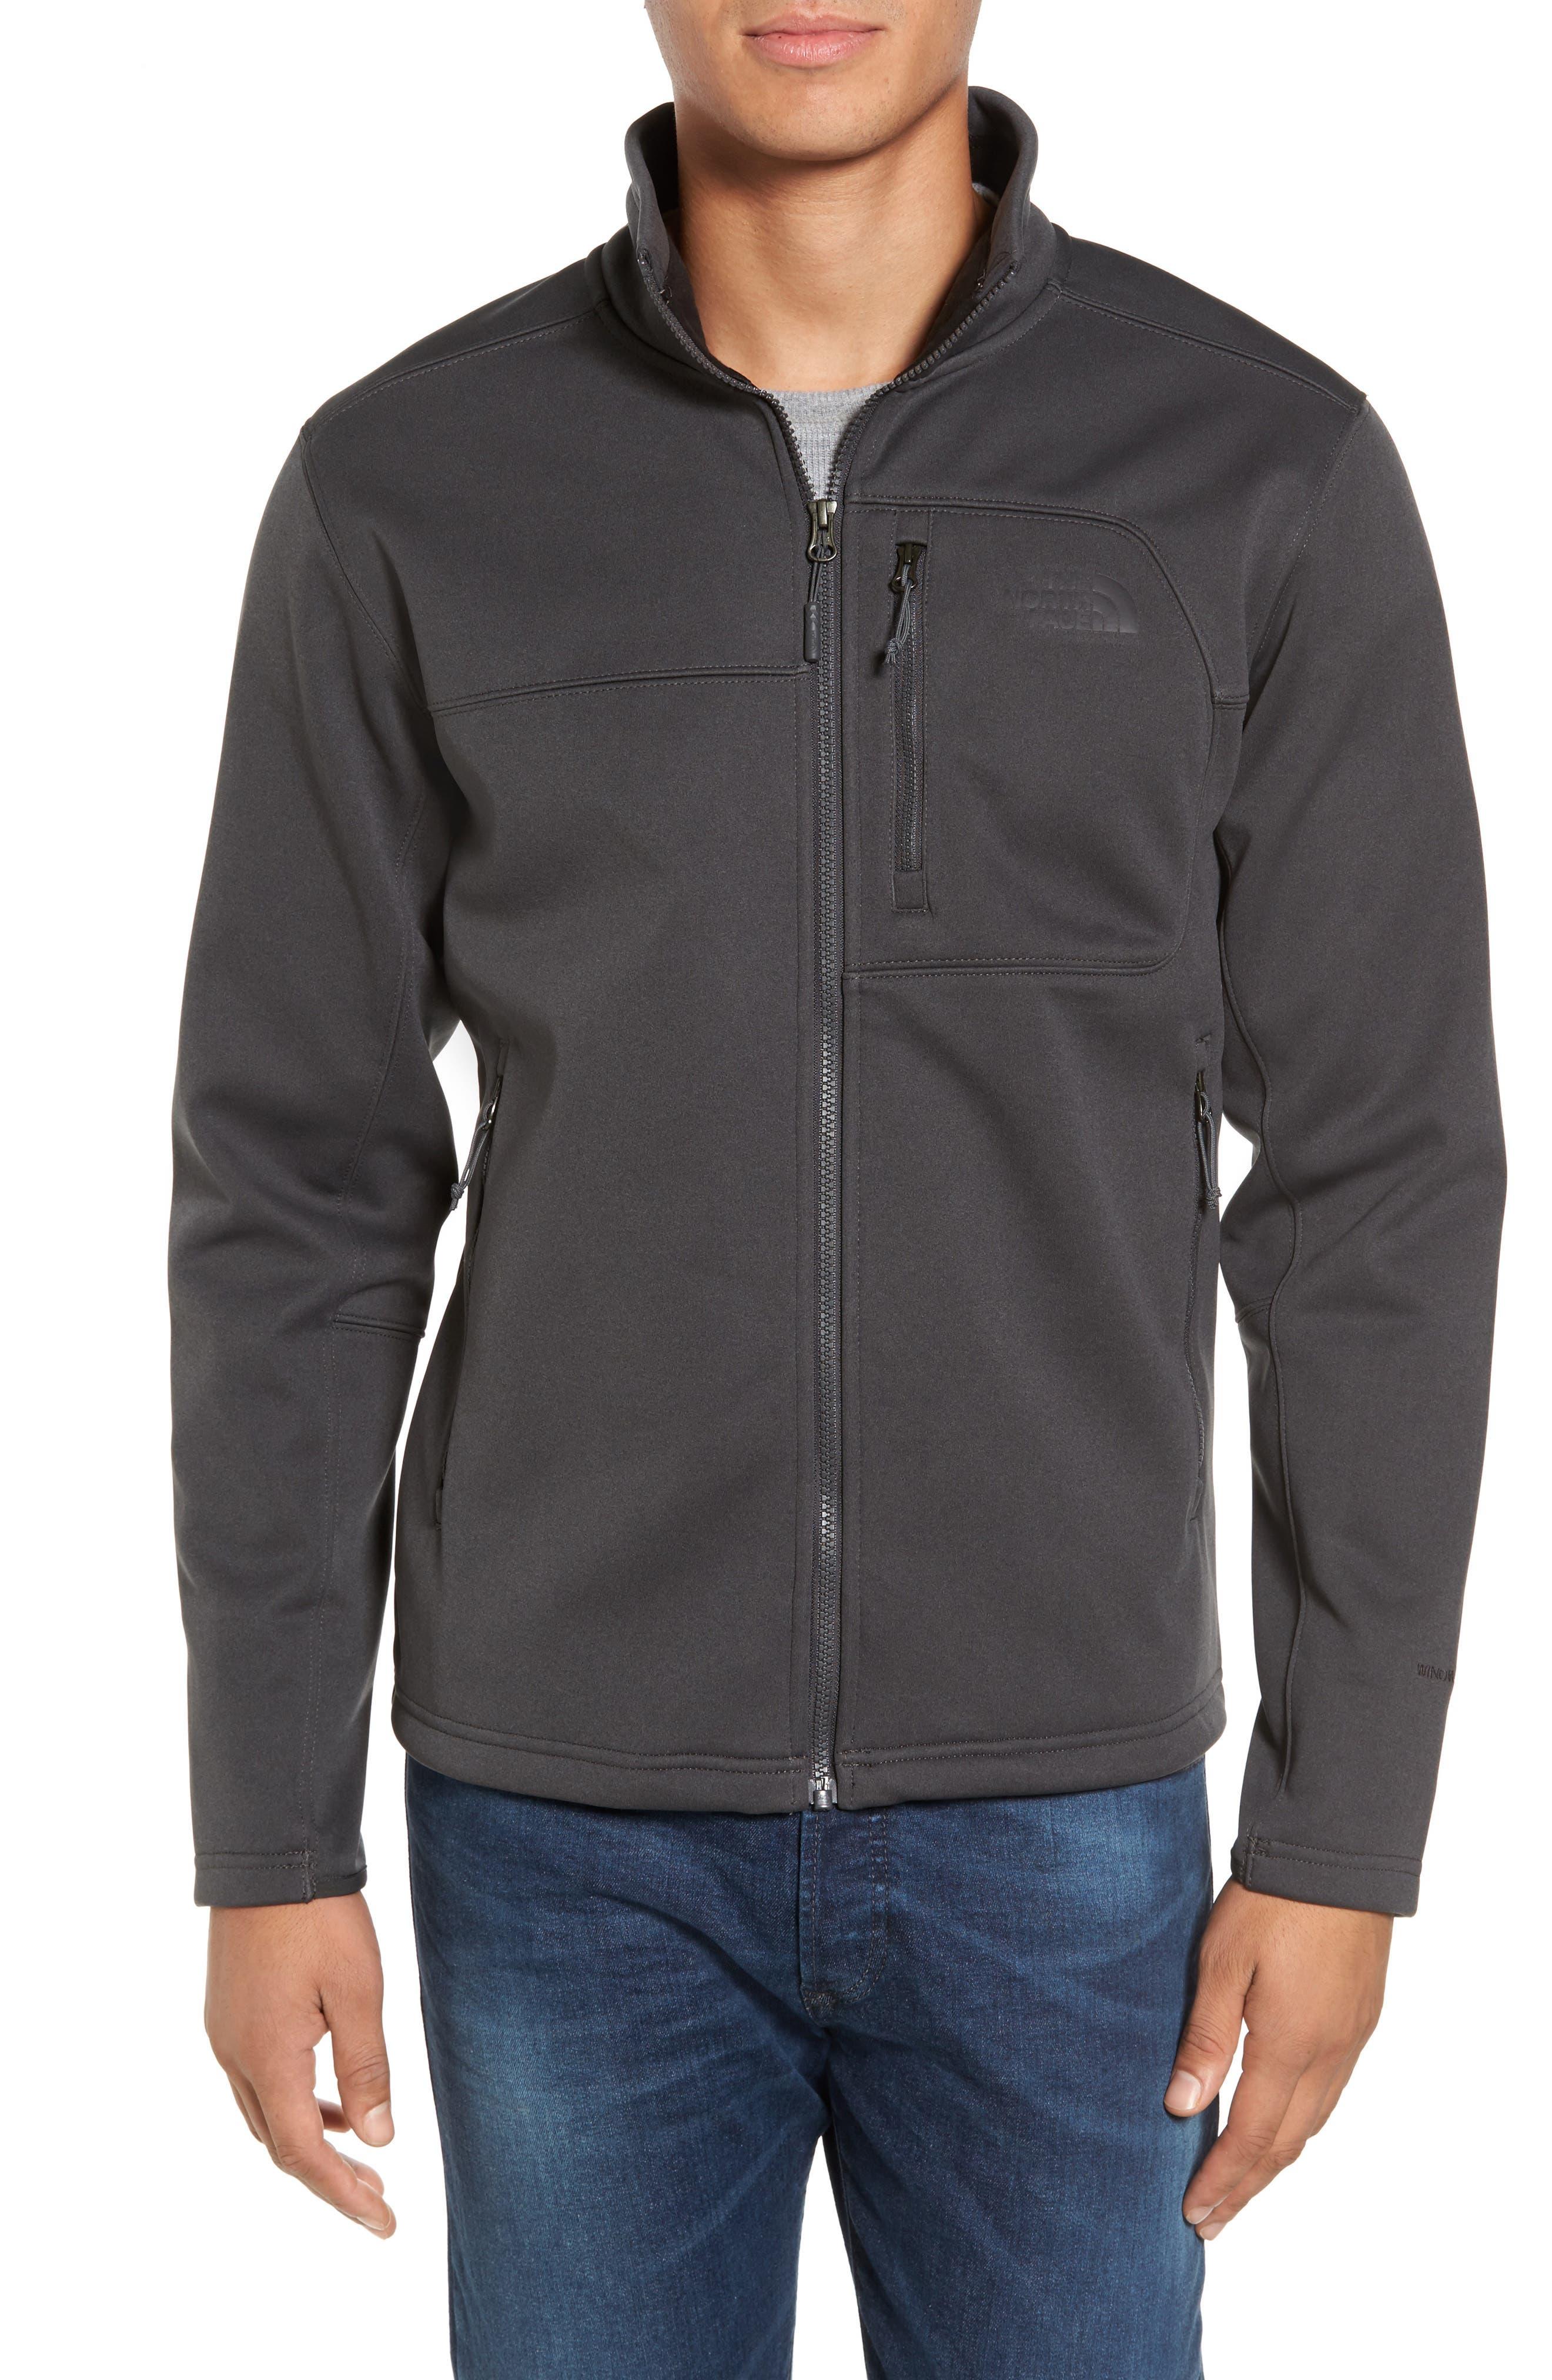 Main Image - The North Face Apex Risor Jacket